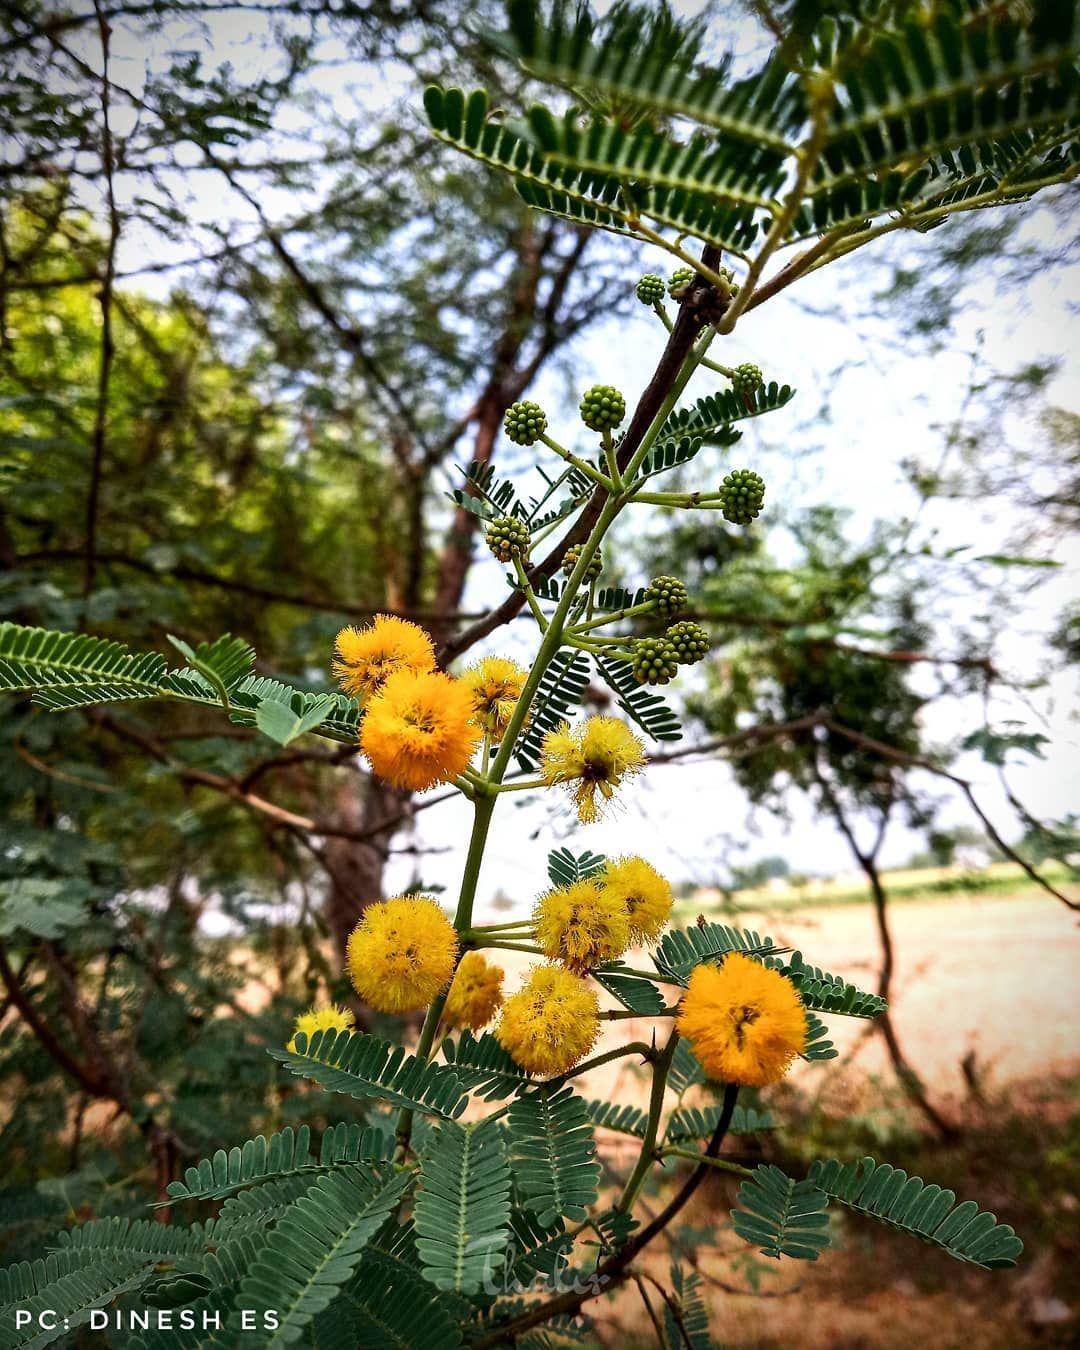 Thalirpics2020 135 கரவலம ப Acacia Nilotica Pc Dinesh Es Teamthalirindia Nature Brilliance Nature In 2020 Flowers Photography Instagram Macro Photography